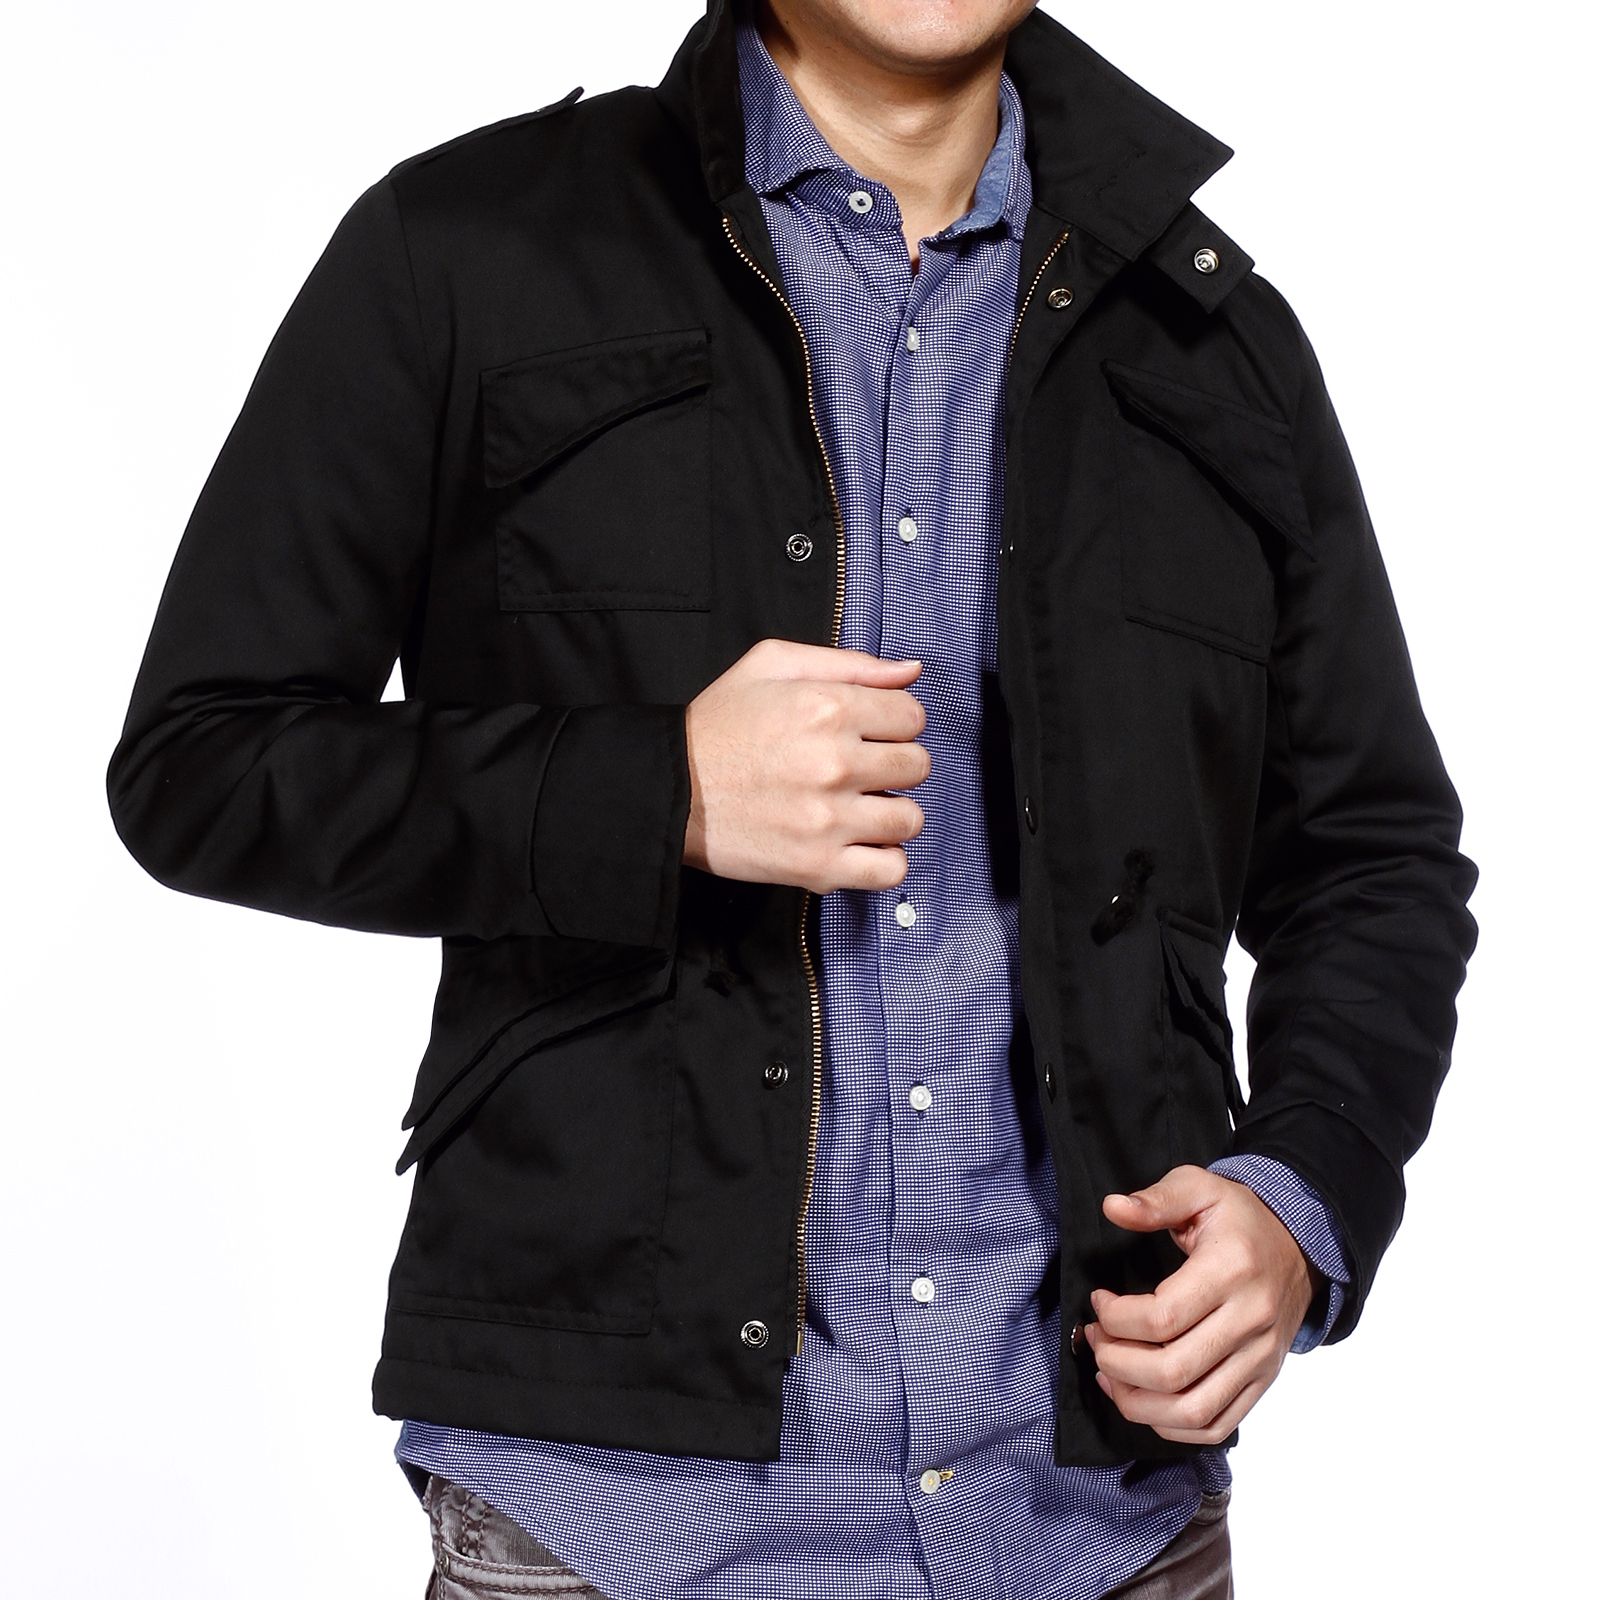 manteau homme jacket blouson moto armee sweat shirt veste. Black Bedroom Furniture Sets. Home Design Ideas